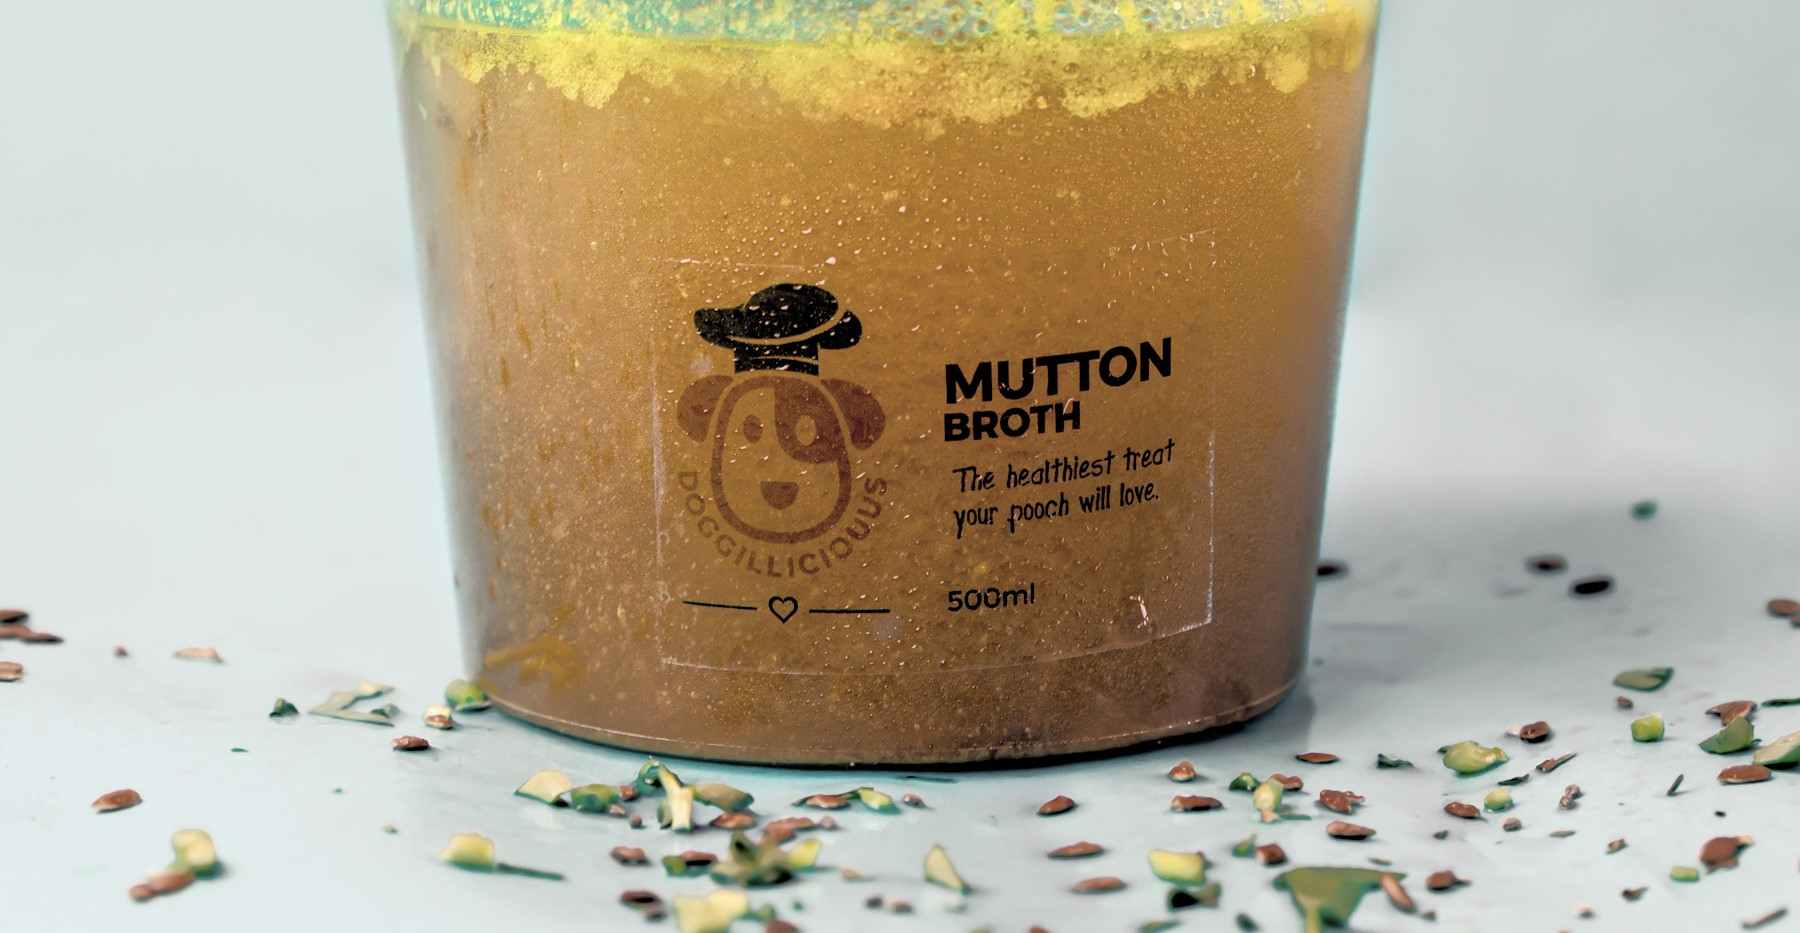 Doggiliciouus Mutton broth